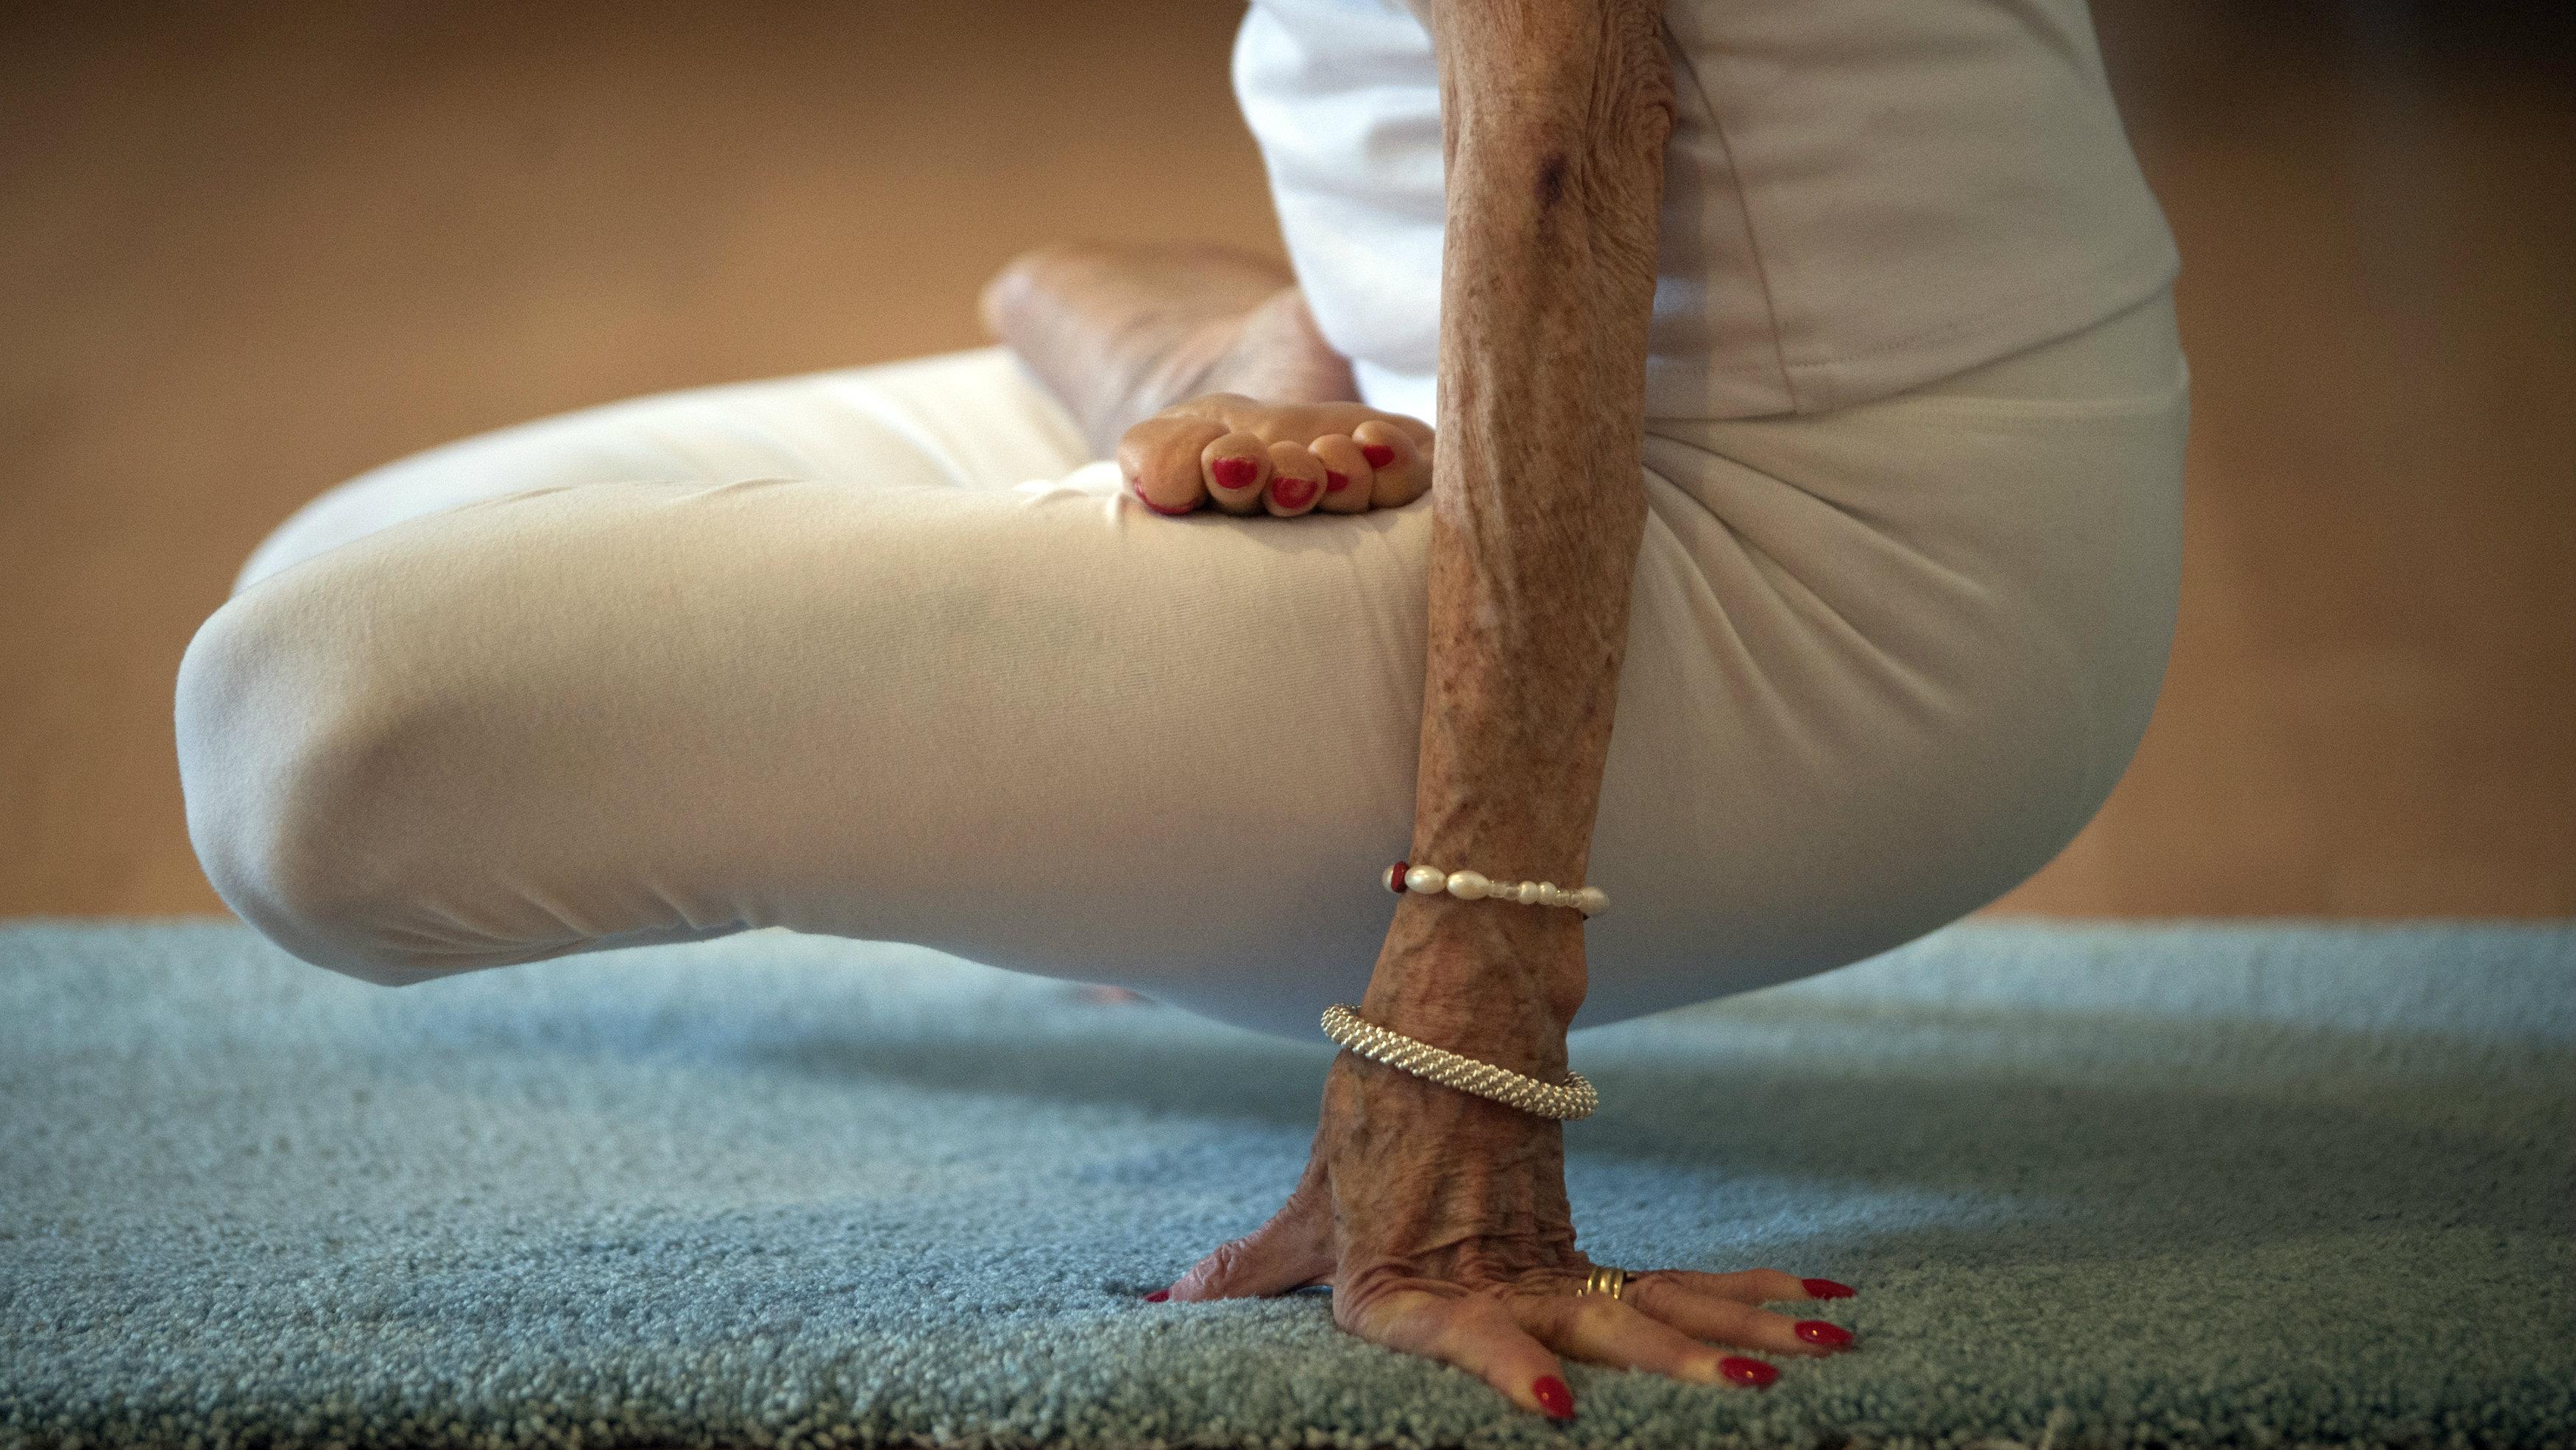 Remain flexible in retirement